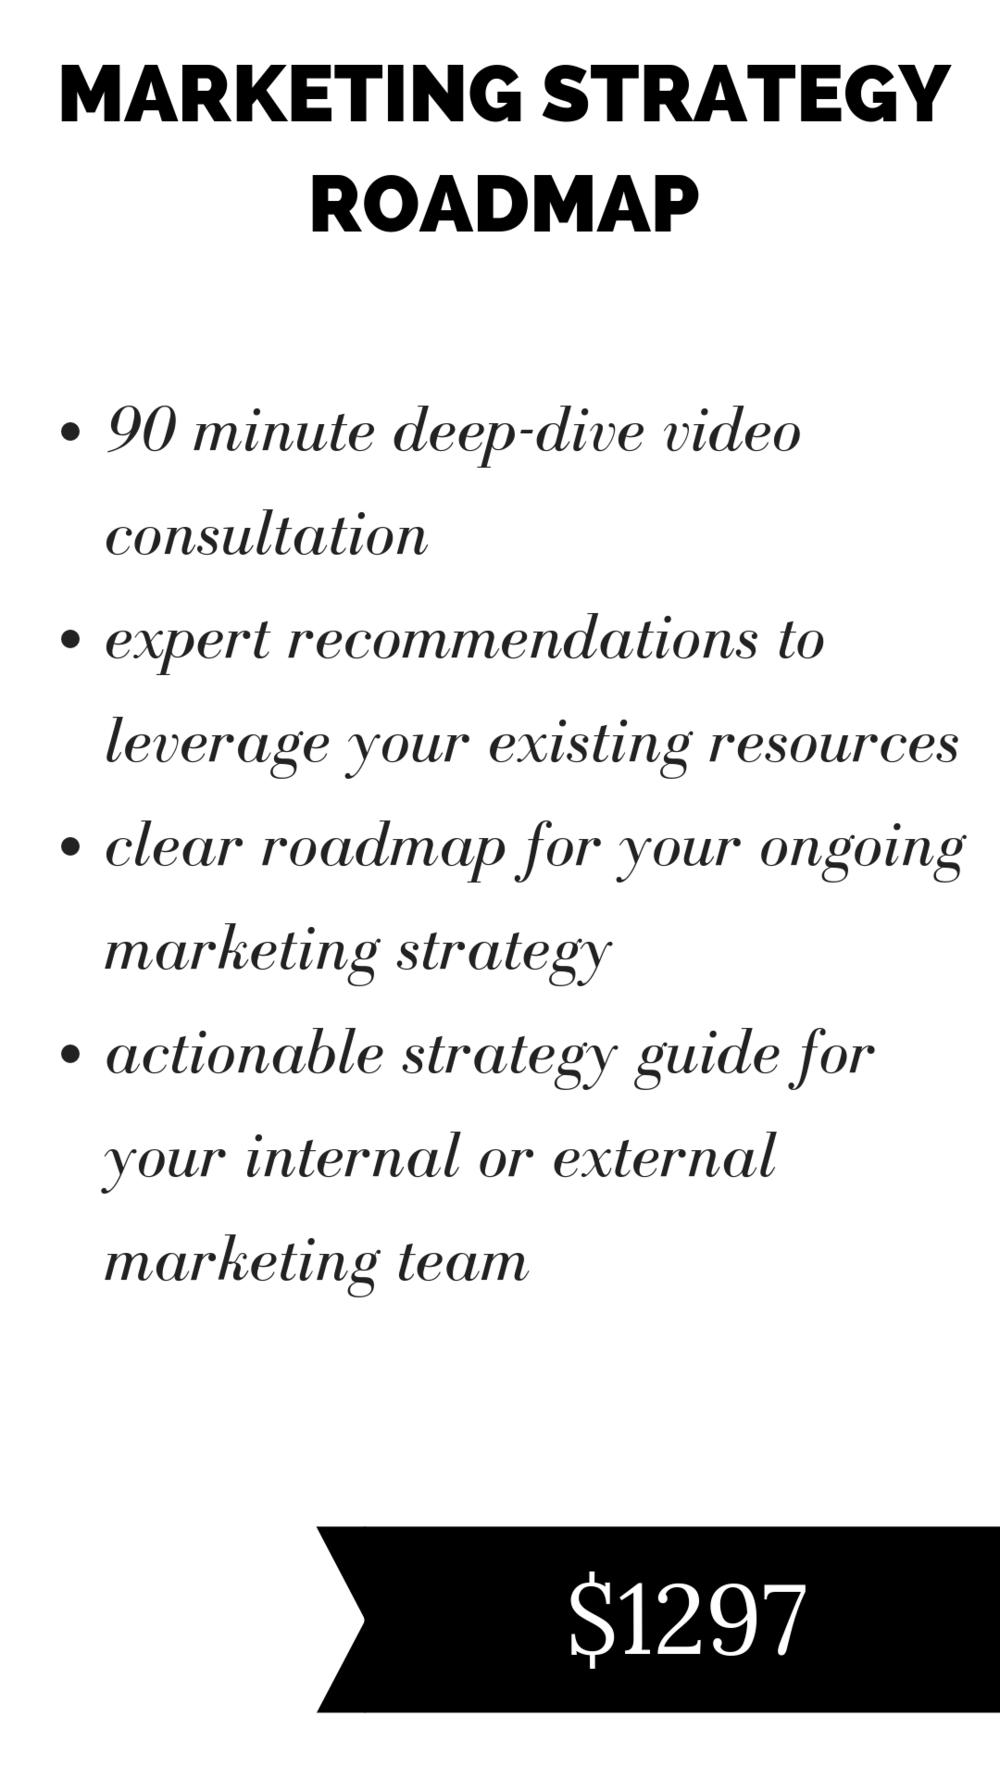 diy marketing strategy guide for interior designers